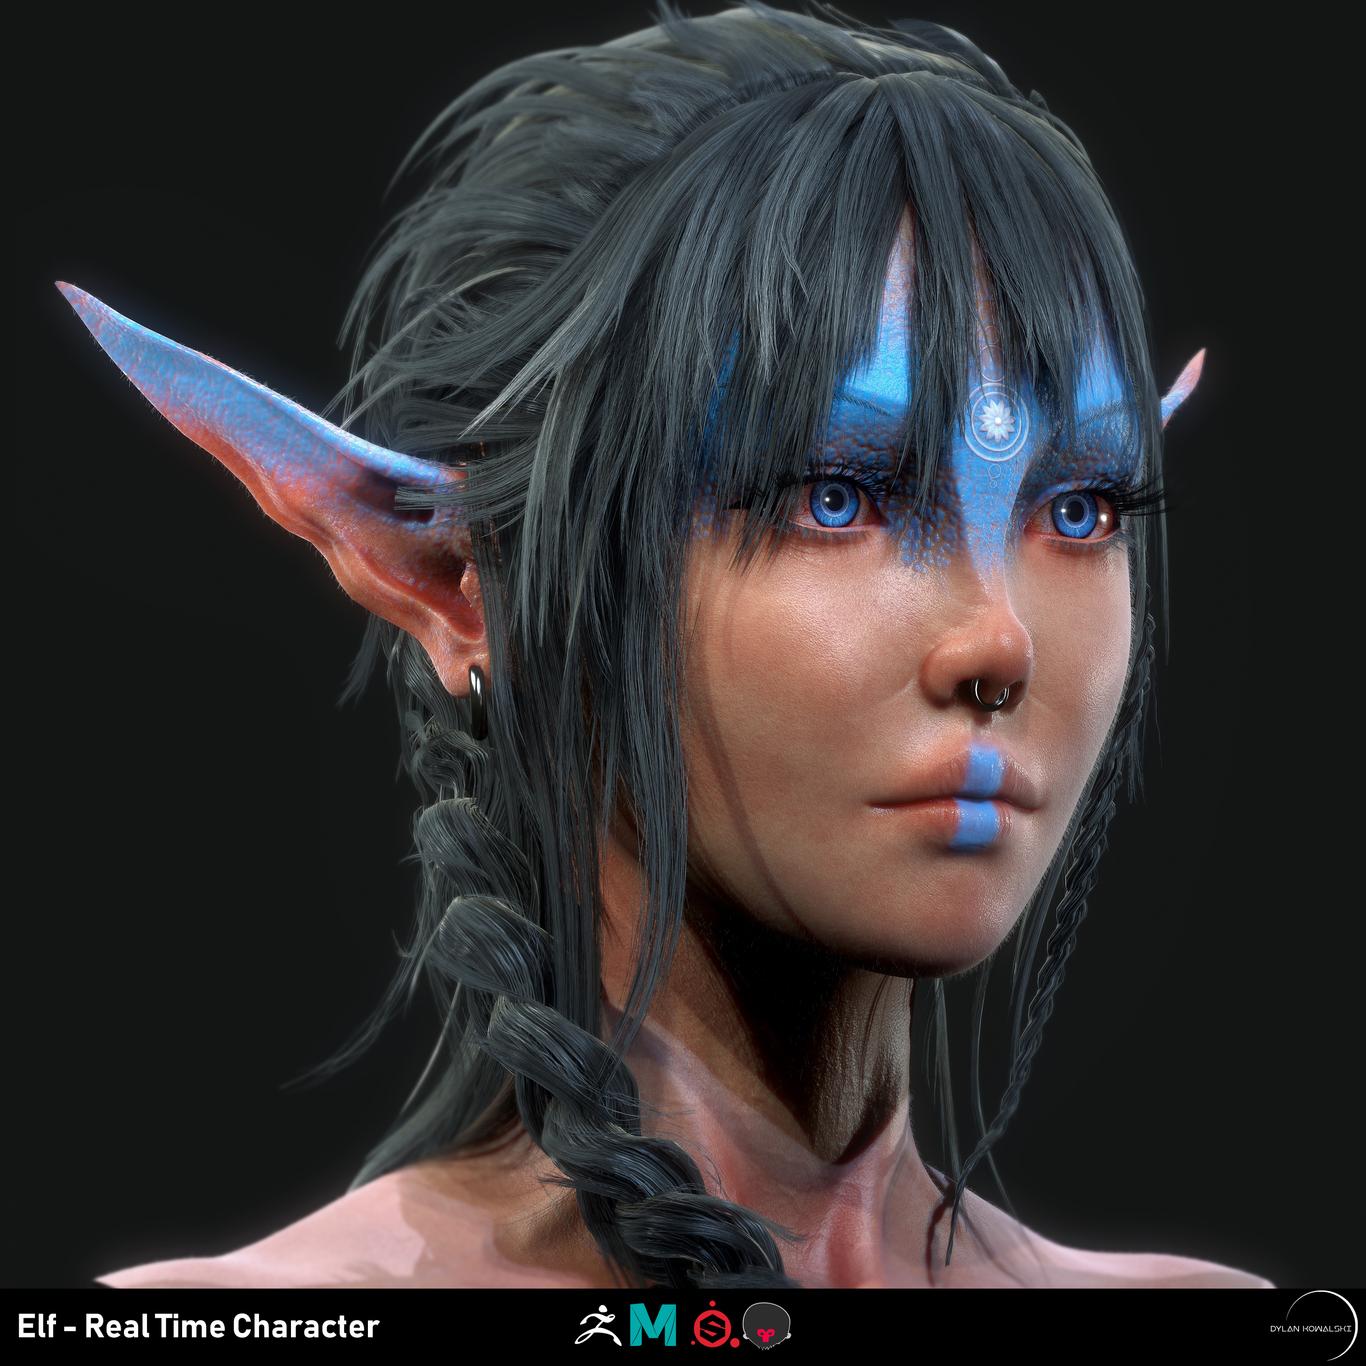 Antiprod elf real time charac 1 bd97db7a lci5